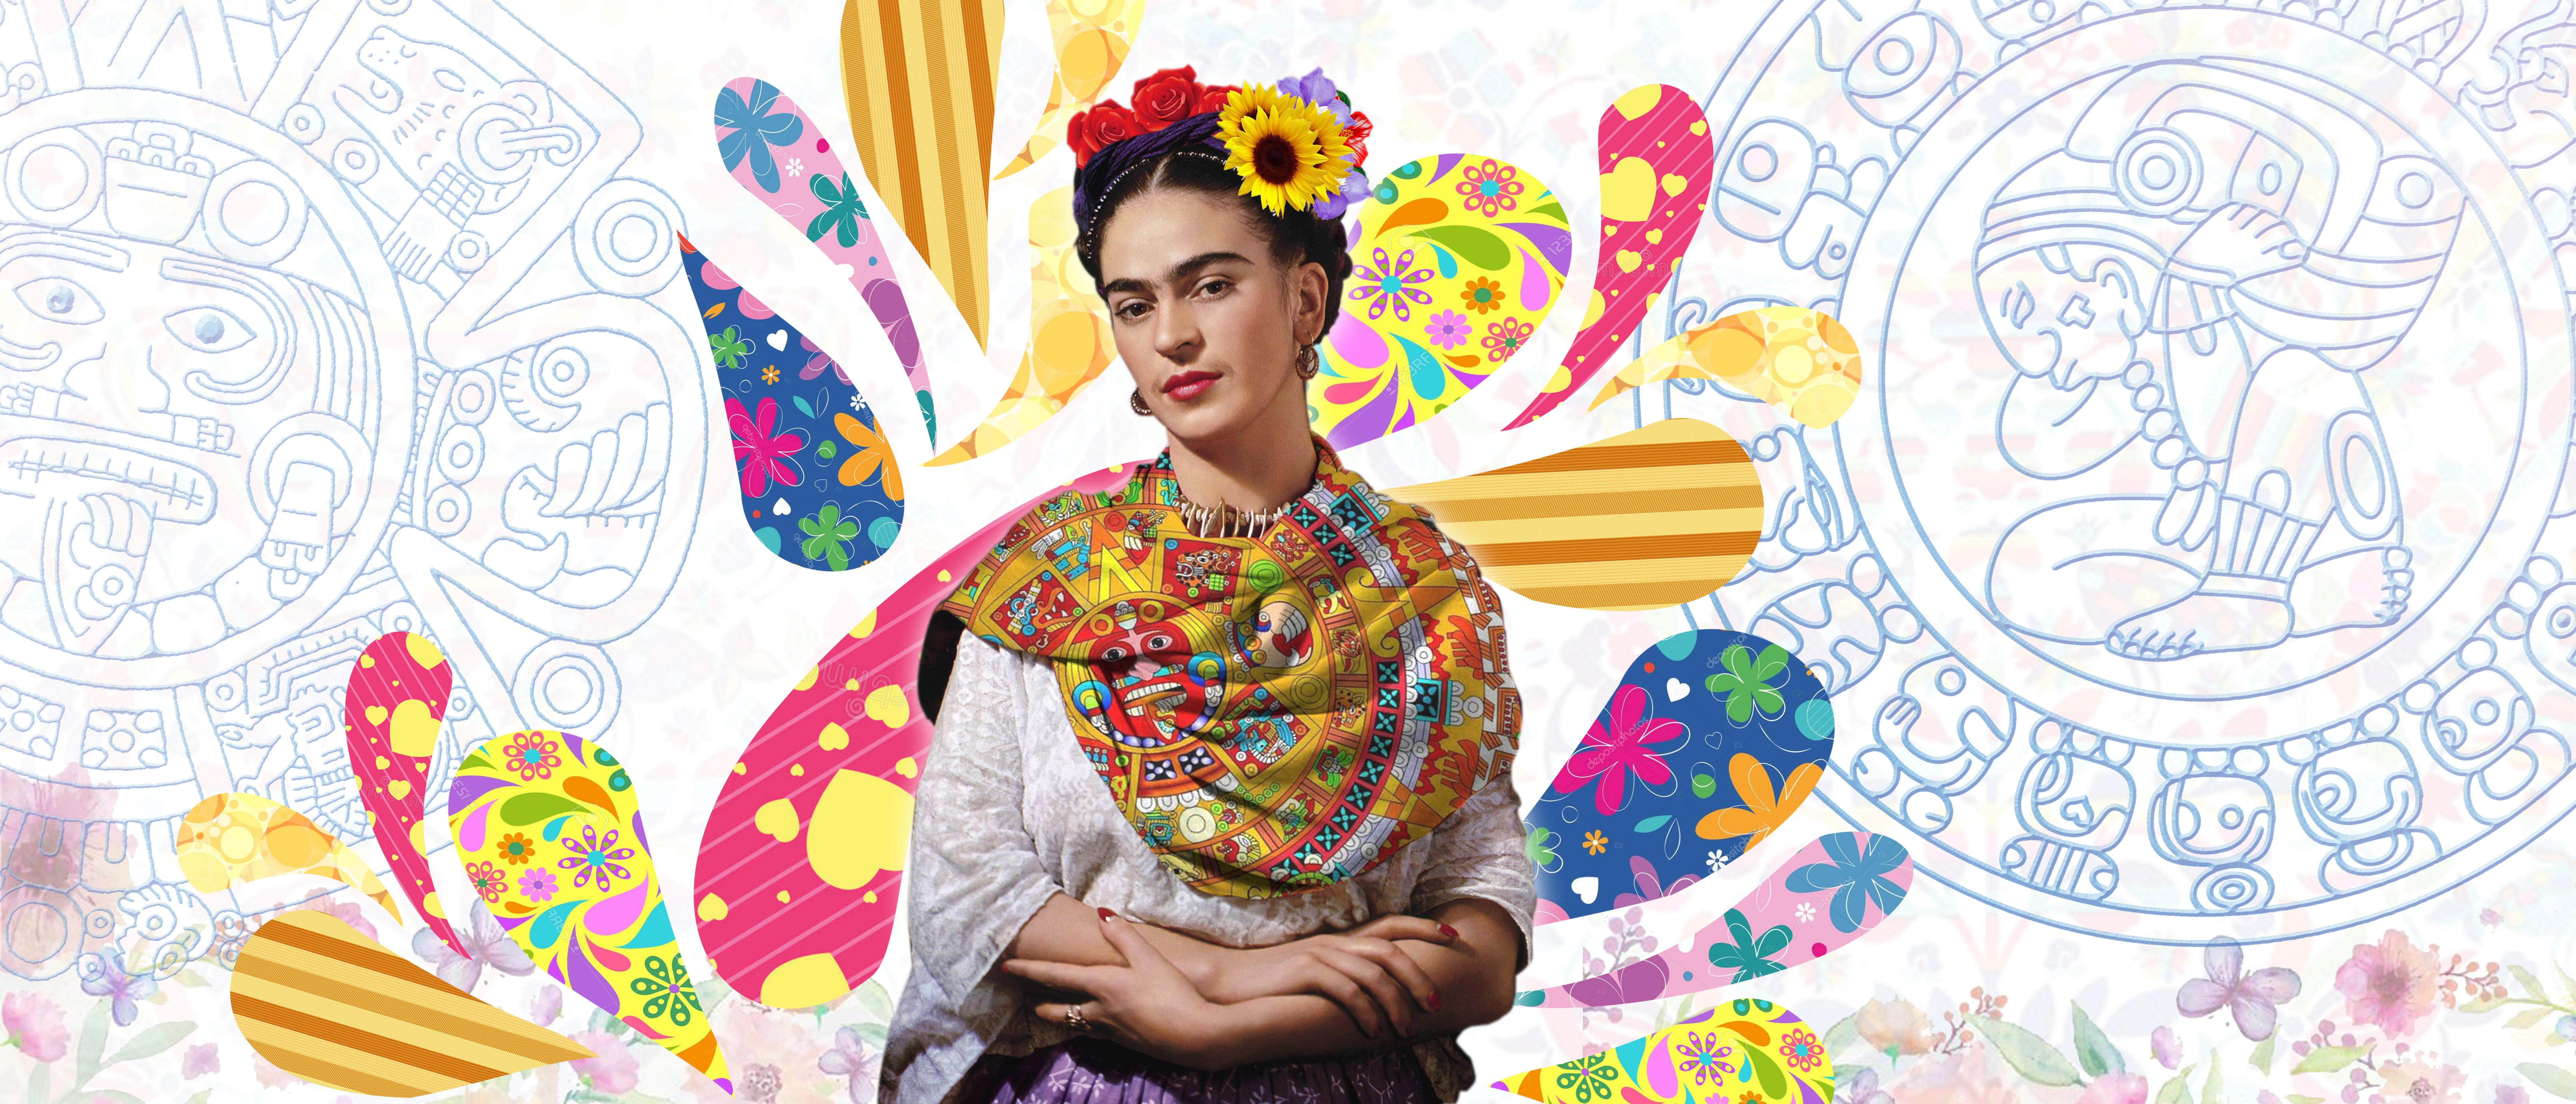 Frida Kahlo Para Dibujar: Sublima, Imprime Y Corta